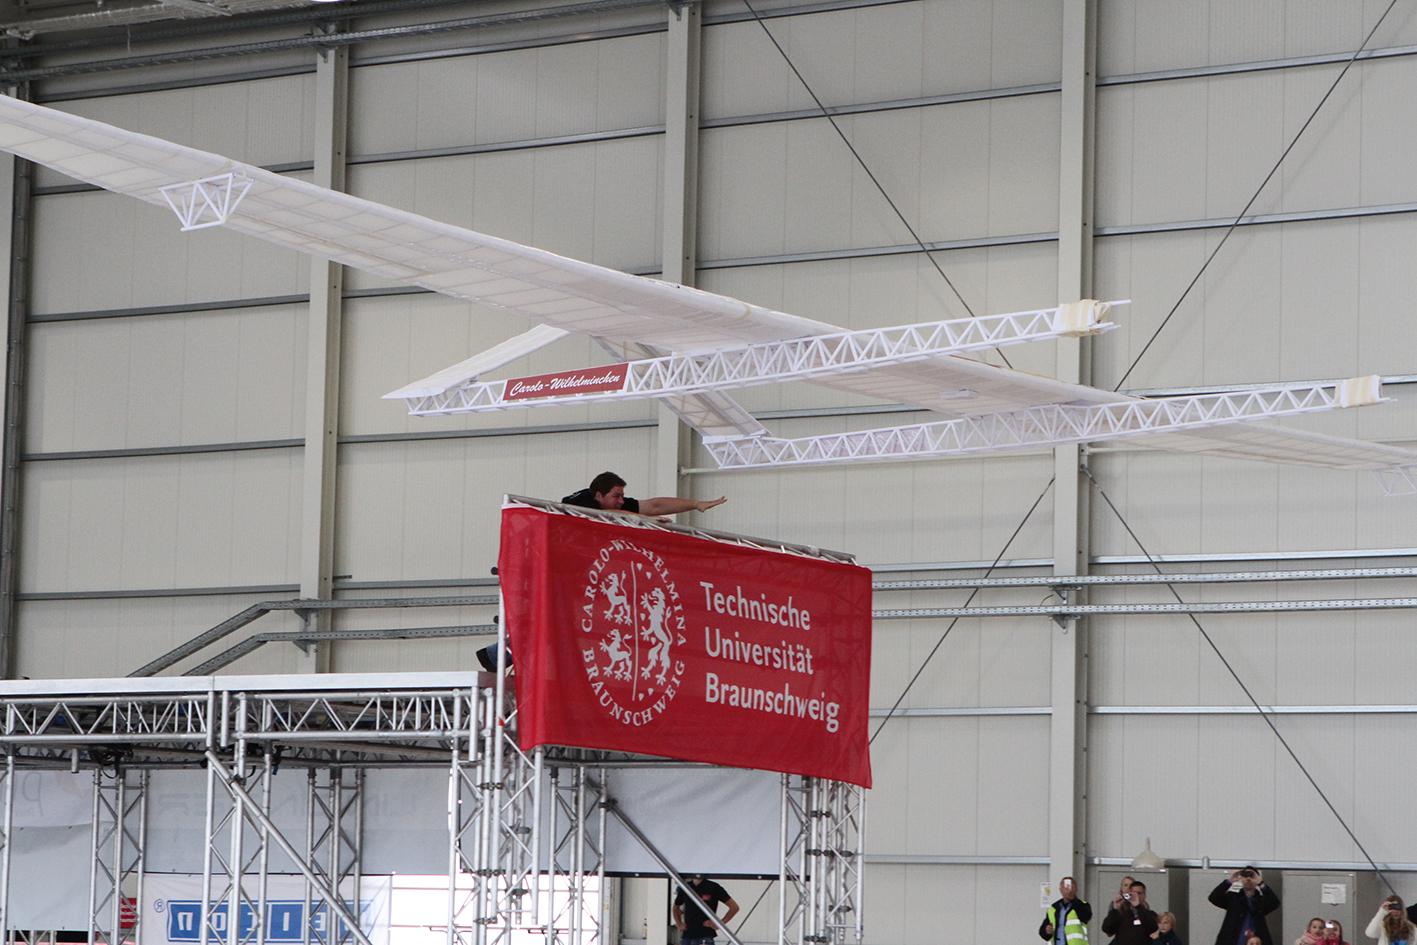 54-foot-span Paper Airplane Breaks Record!